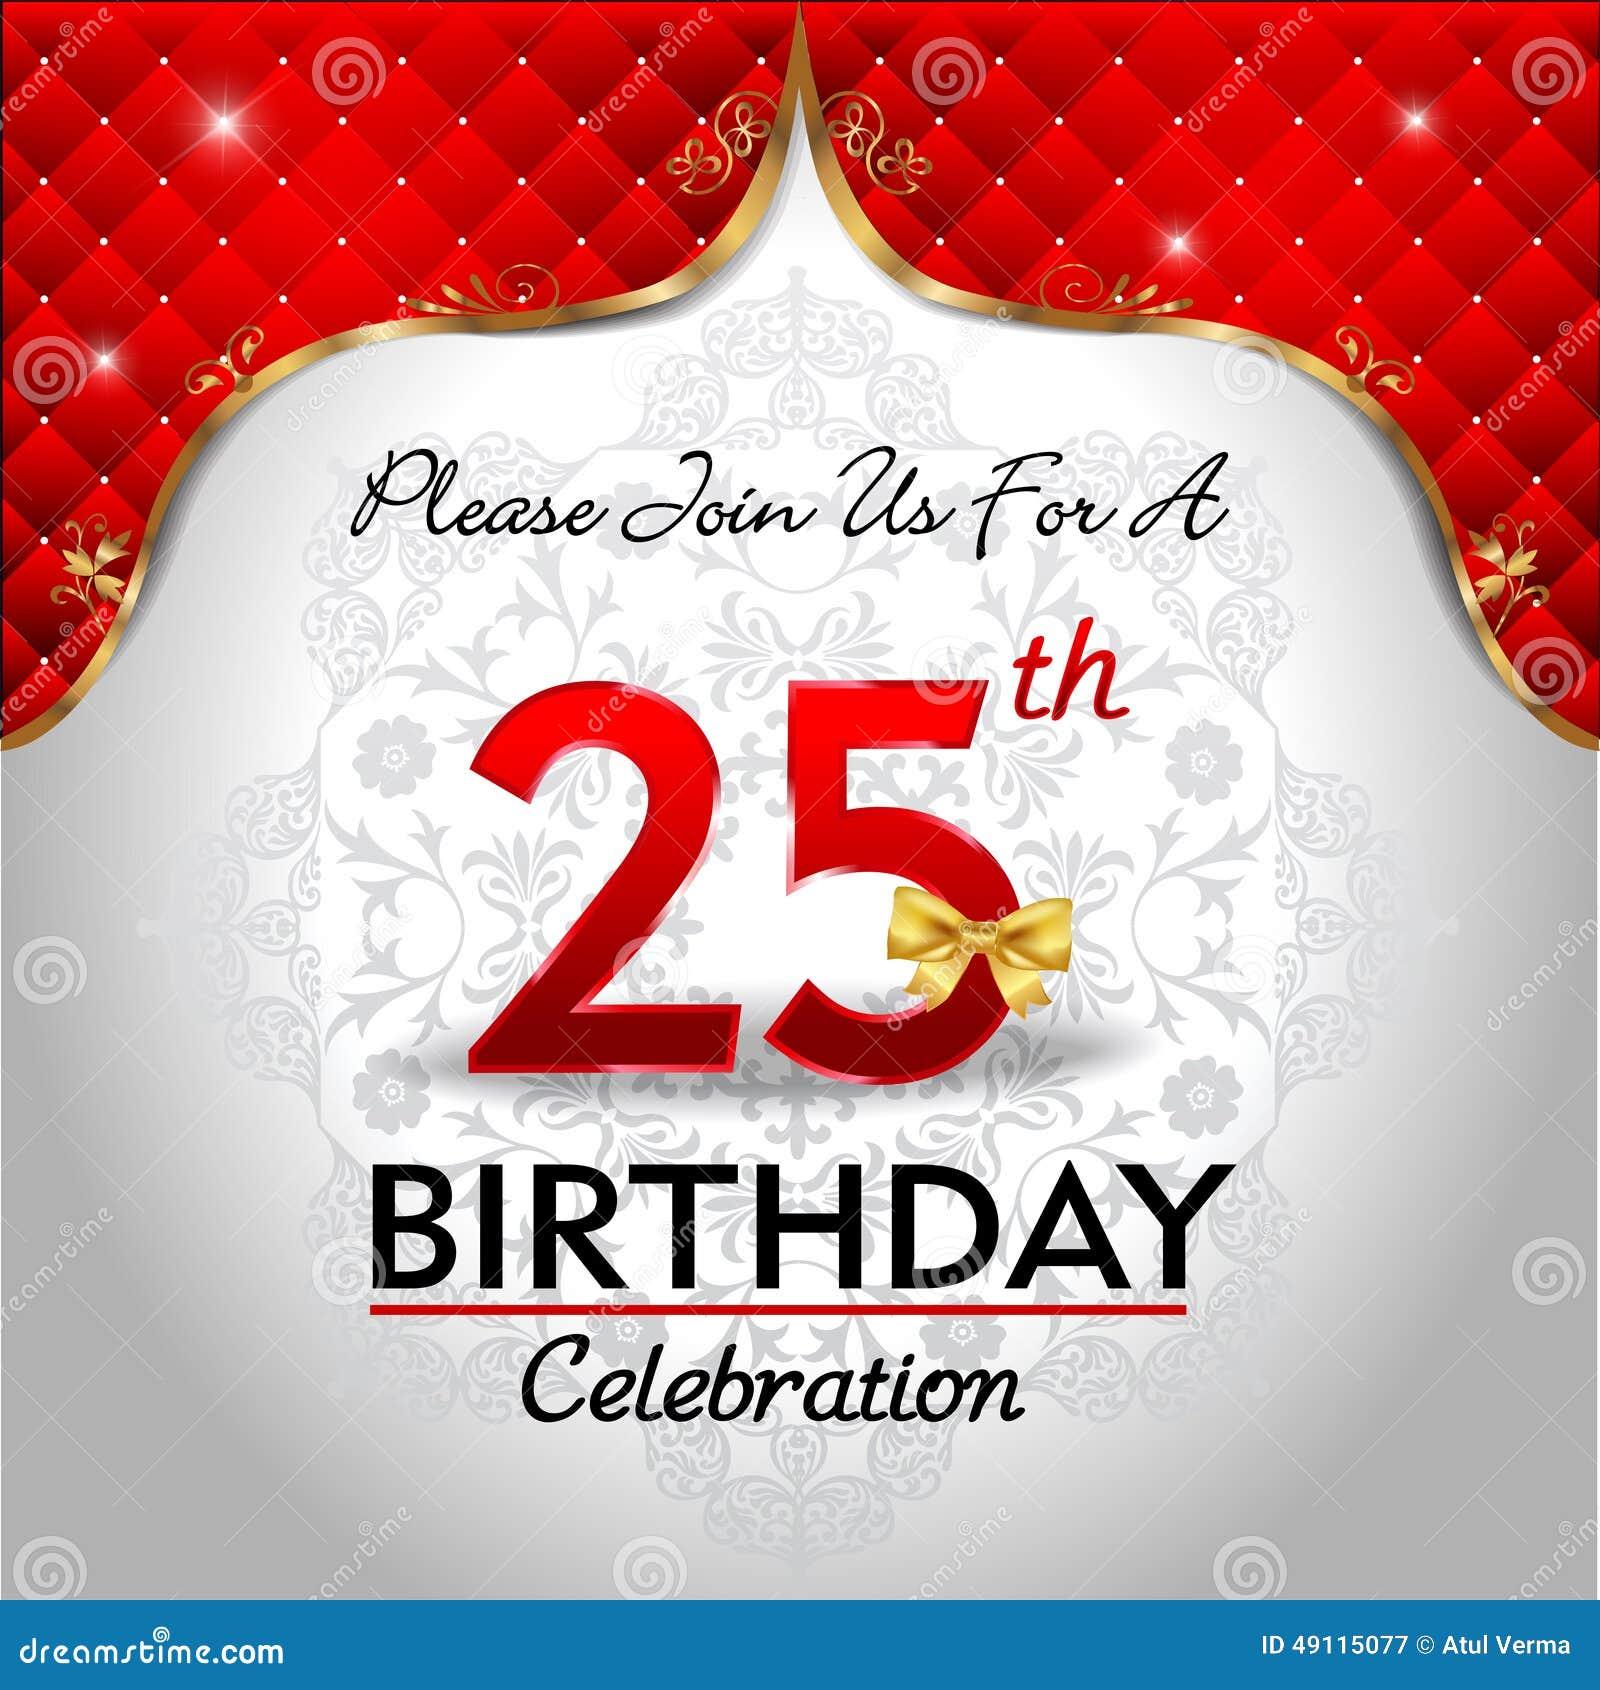 Estremamente Happy birthday 25 years stock vector. Image of mother - 90388866 WA67